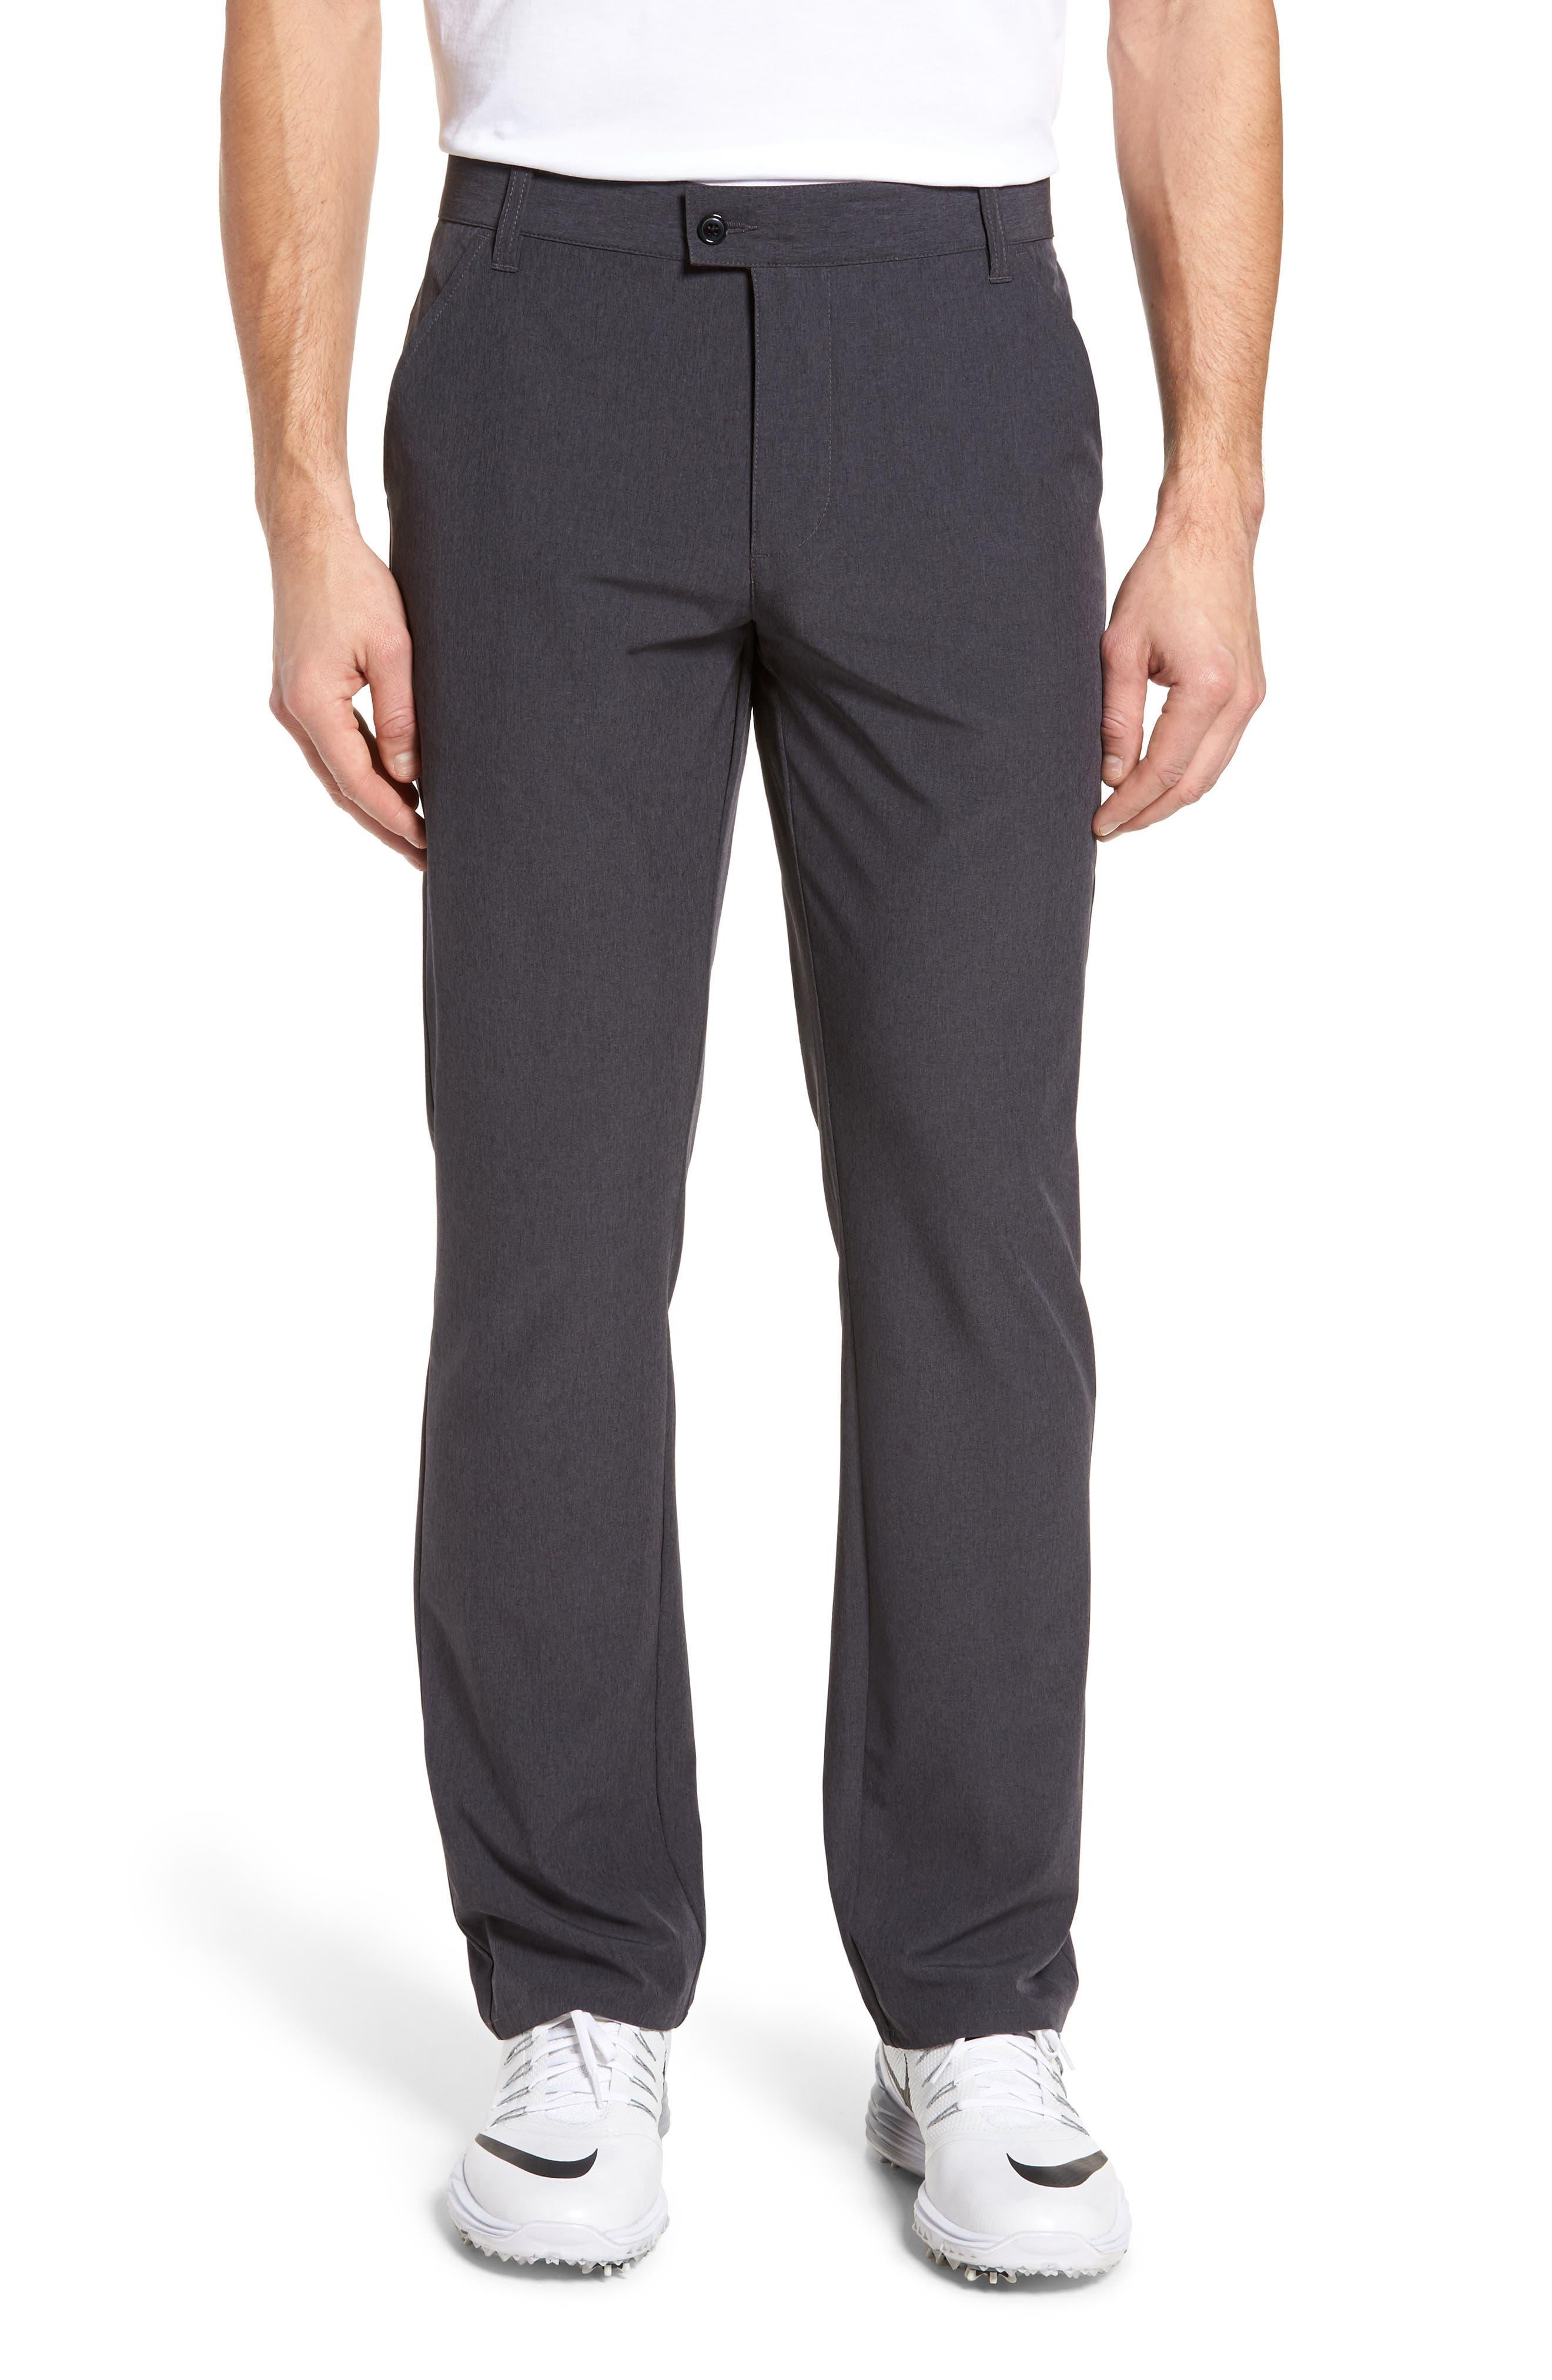 TRAVISMATHEW Pantladdium Pants, Main, color, HEATHER BLACK